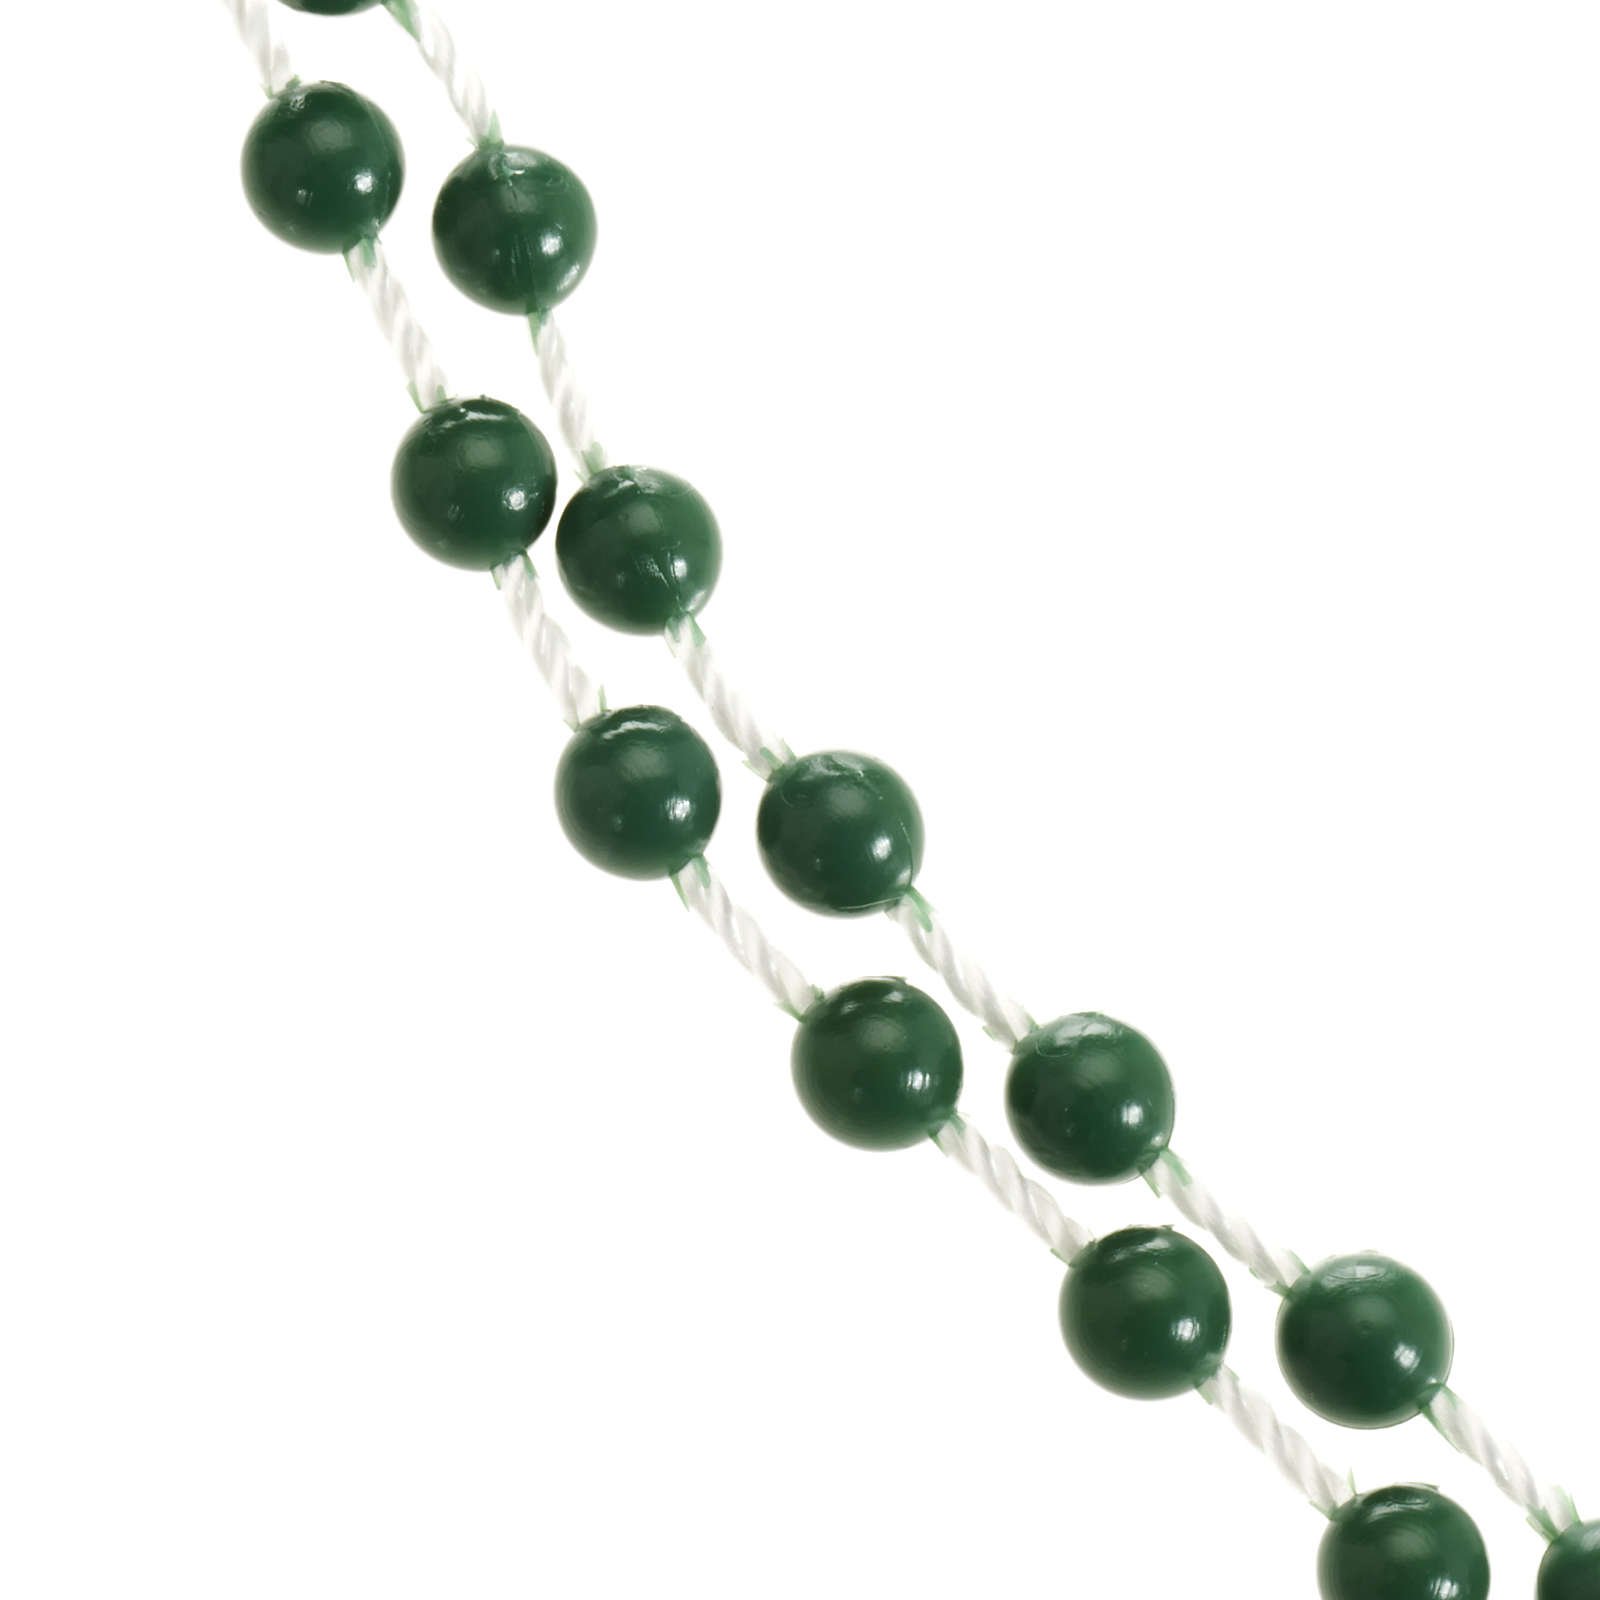 Chapelet nylon vert 4